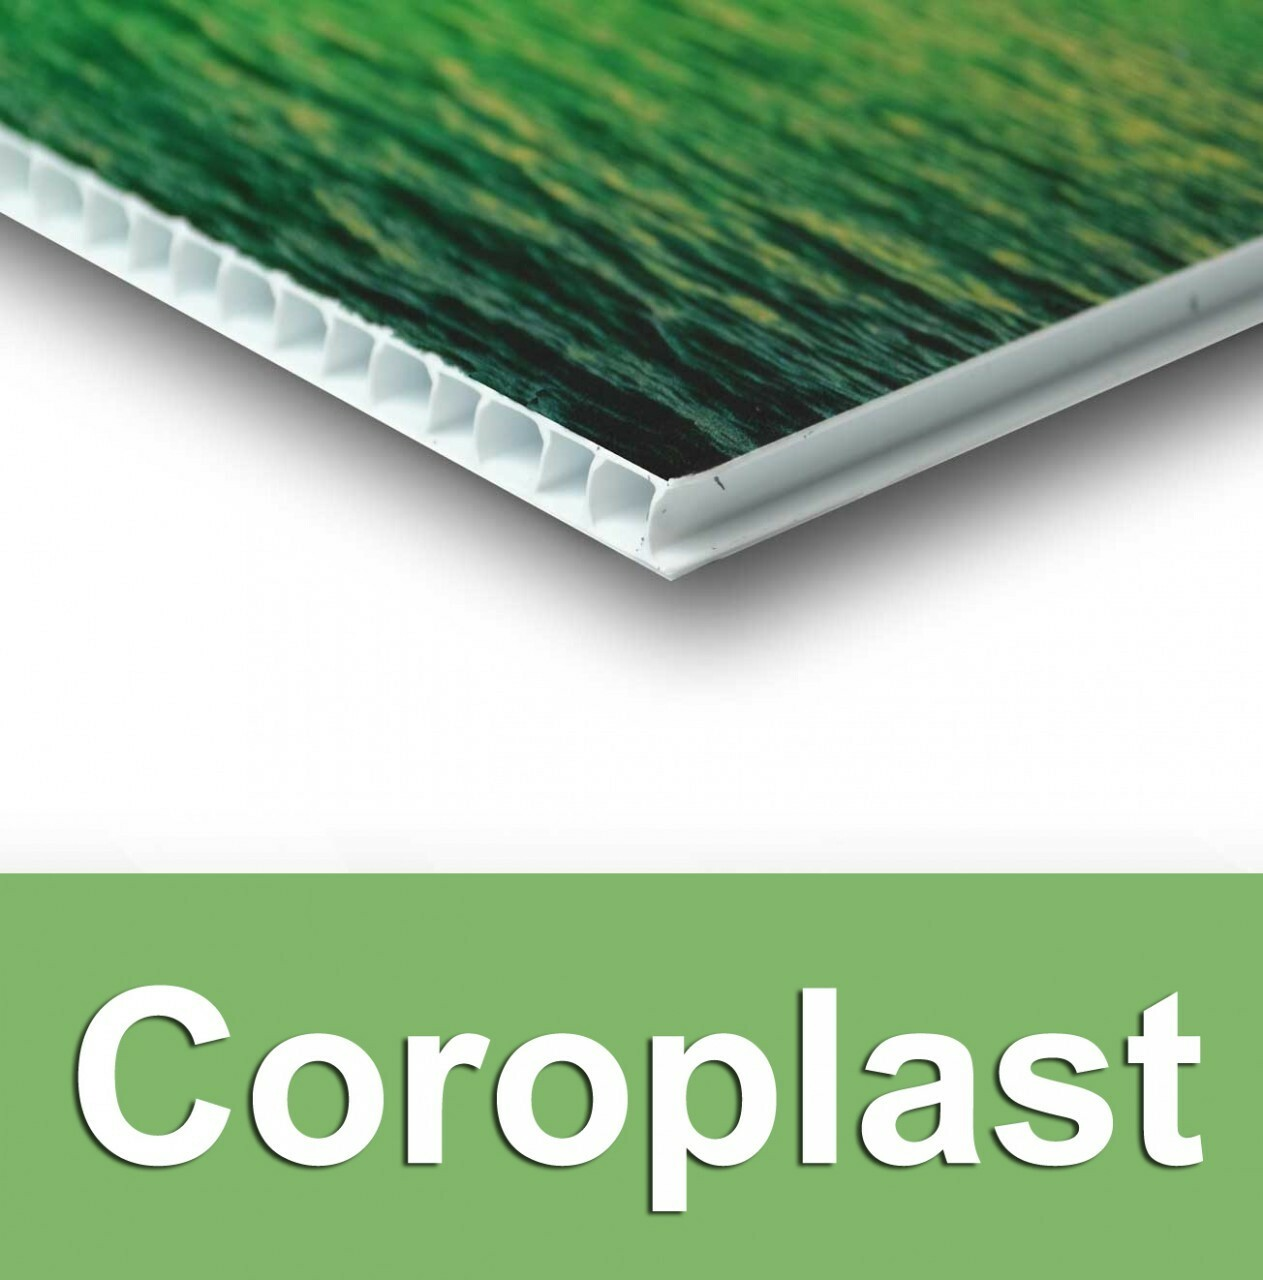 Coroplast Sign 4 mil (1/8